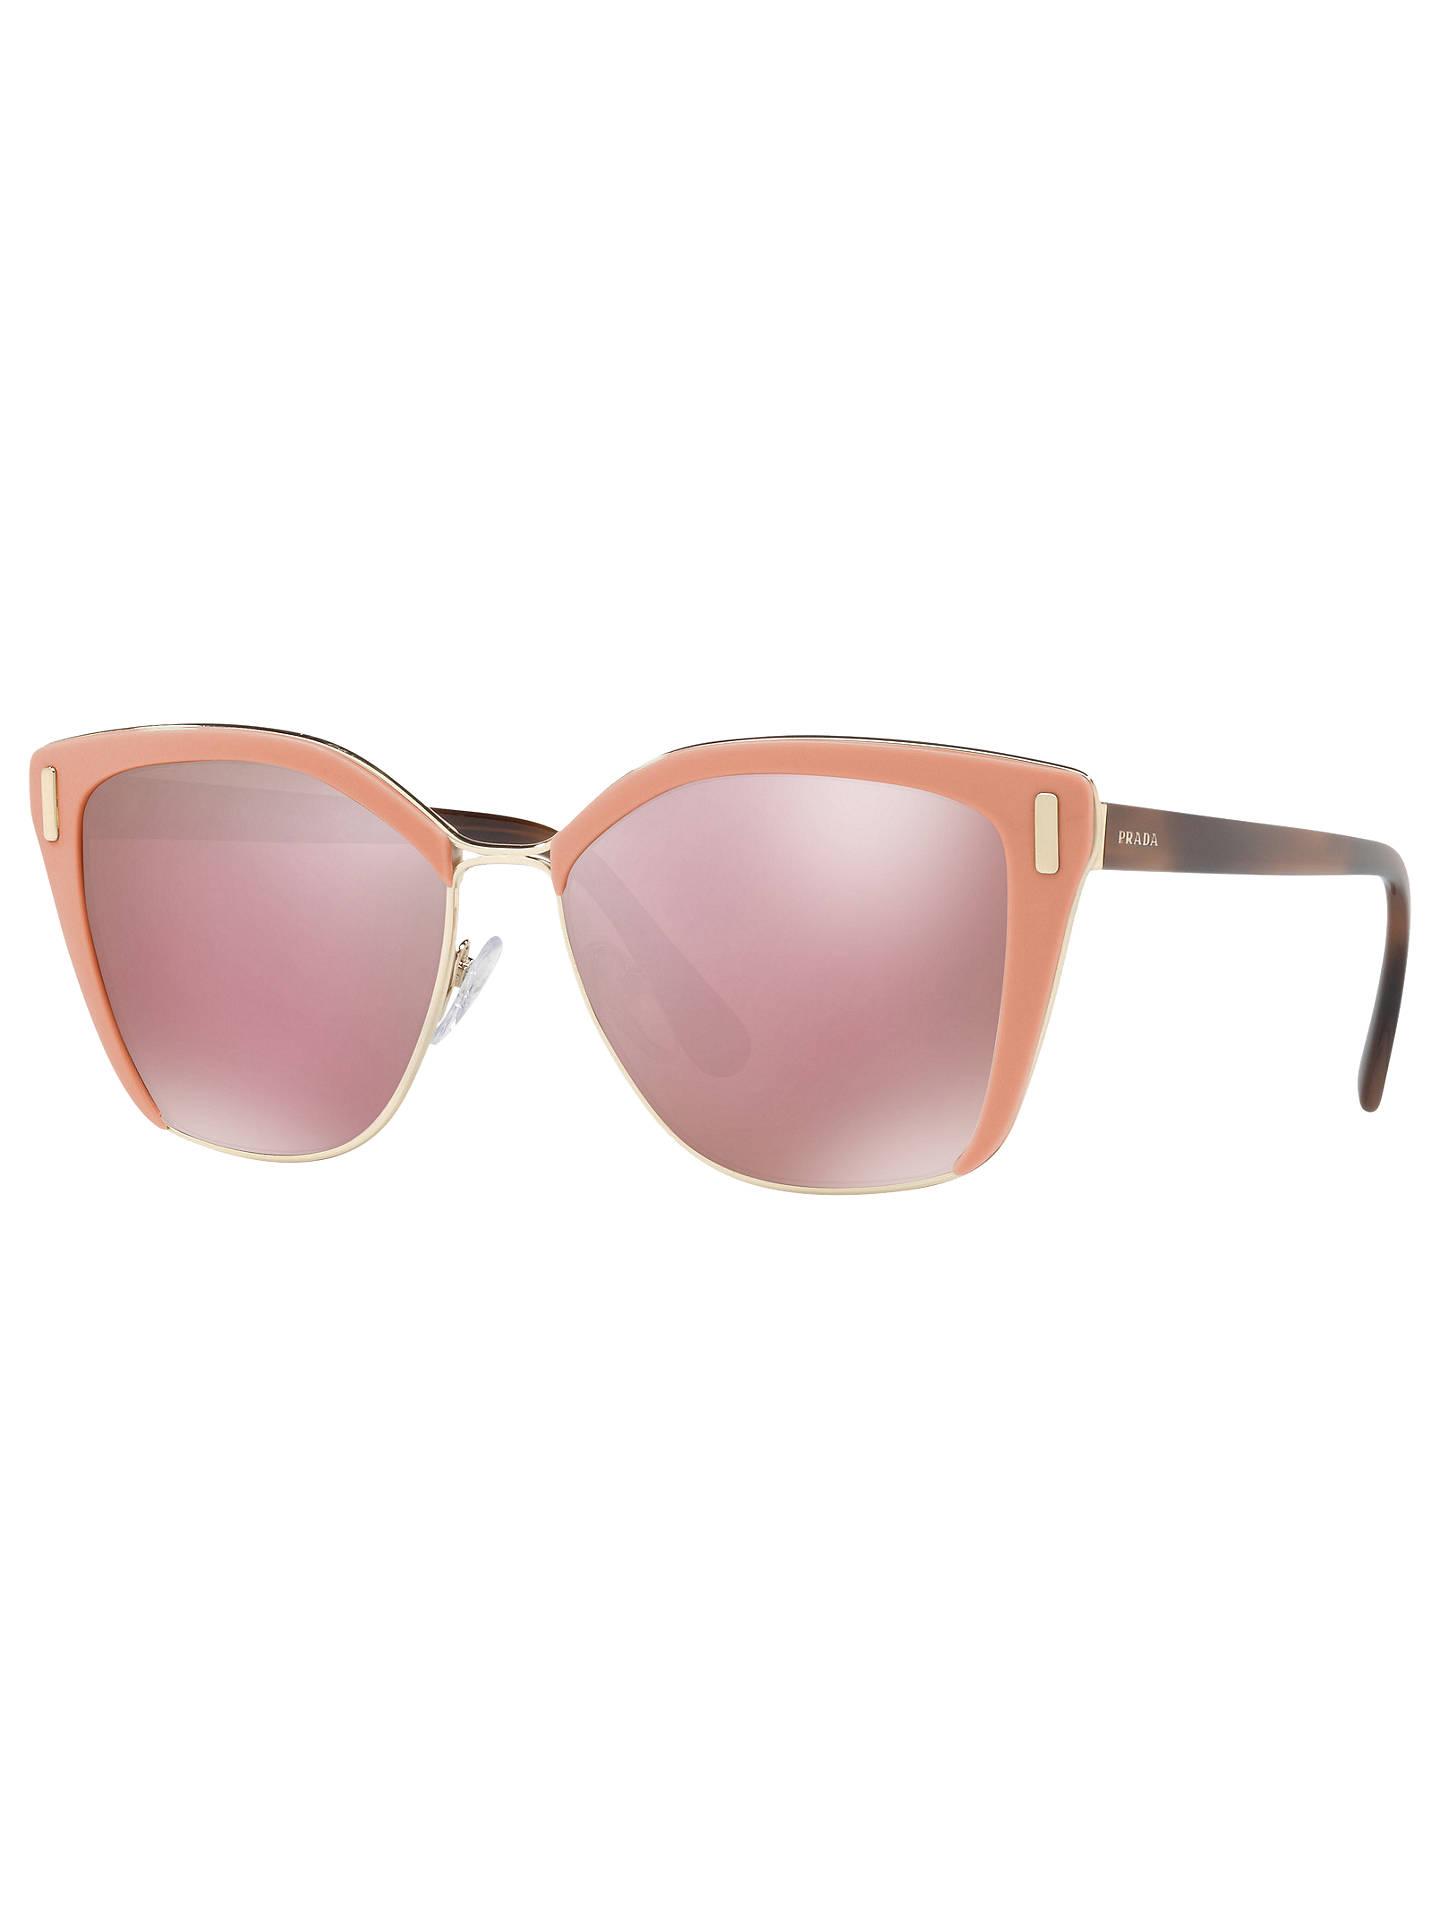 2a1eae1bdae0 Buy Prada PR 56TS Square Sunglasses, Pink/Mirror Rose Online at  johnlewis.com ...